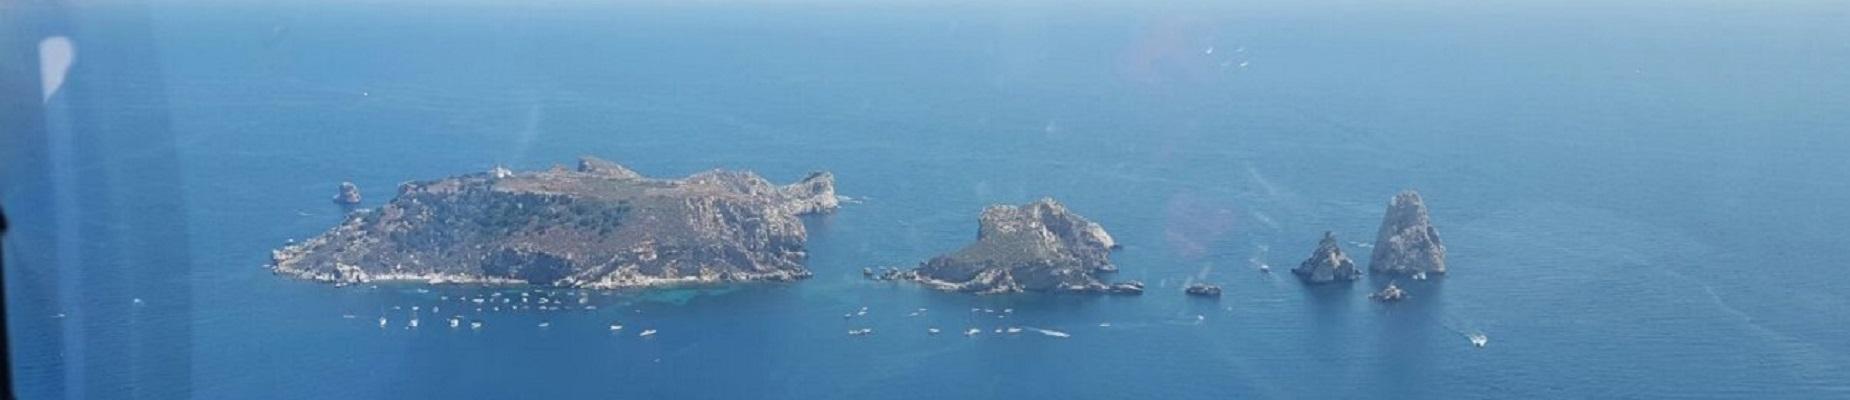 Volando Illes Medes